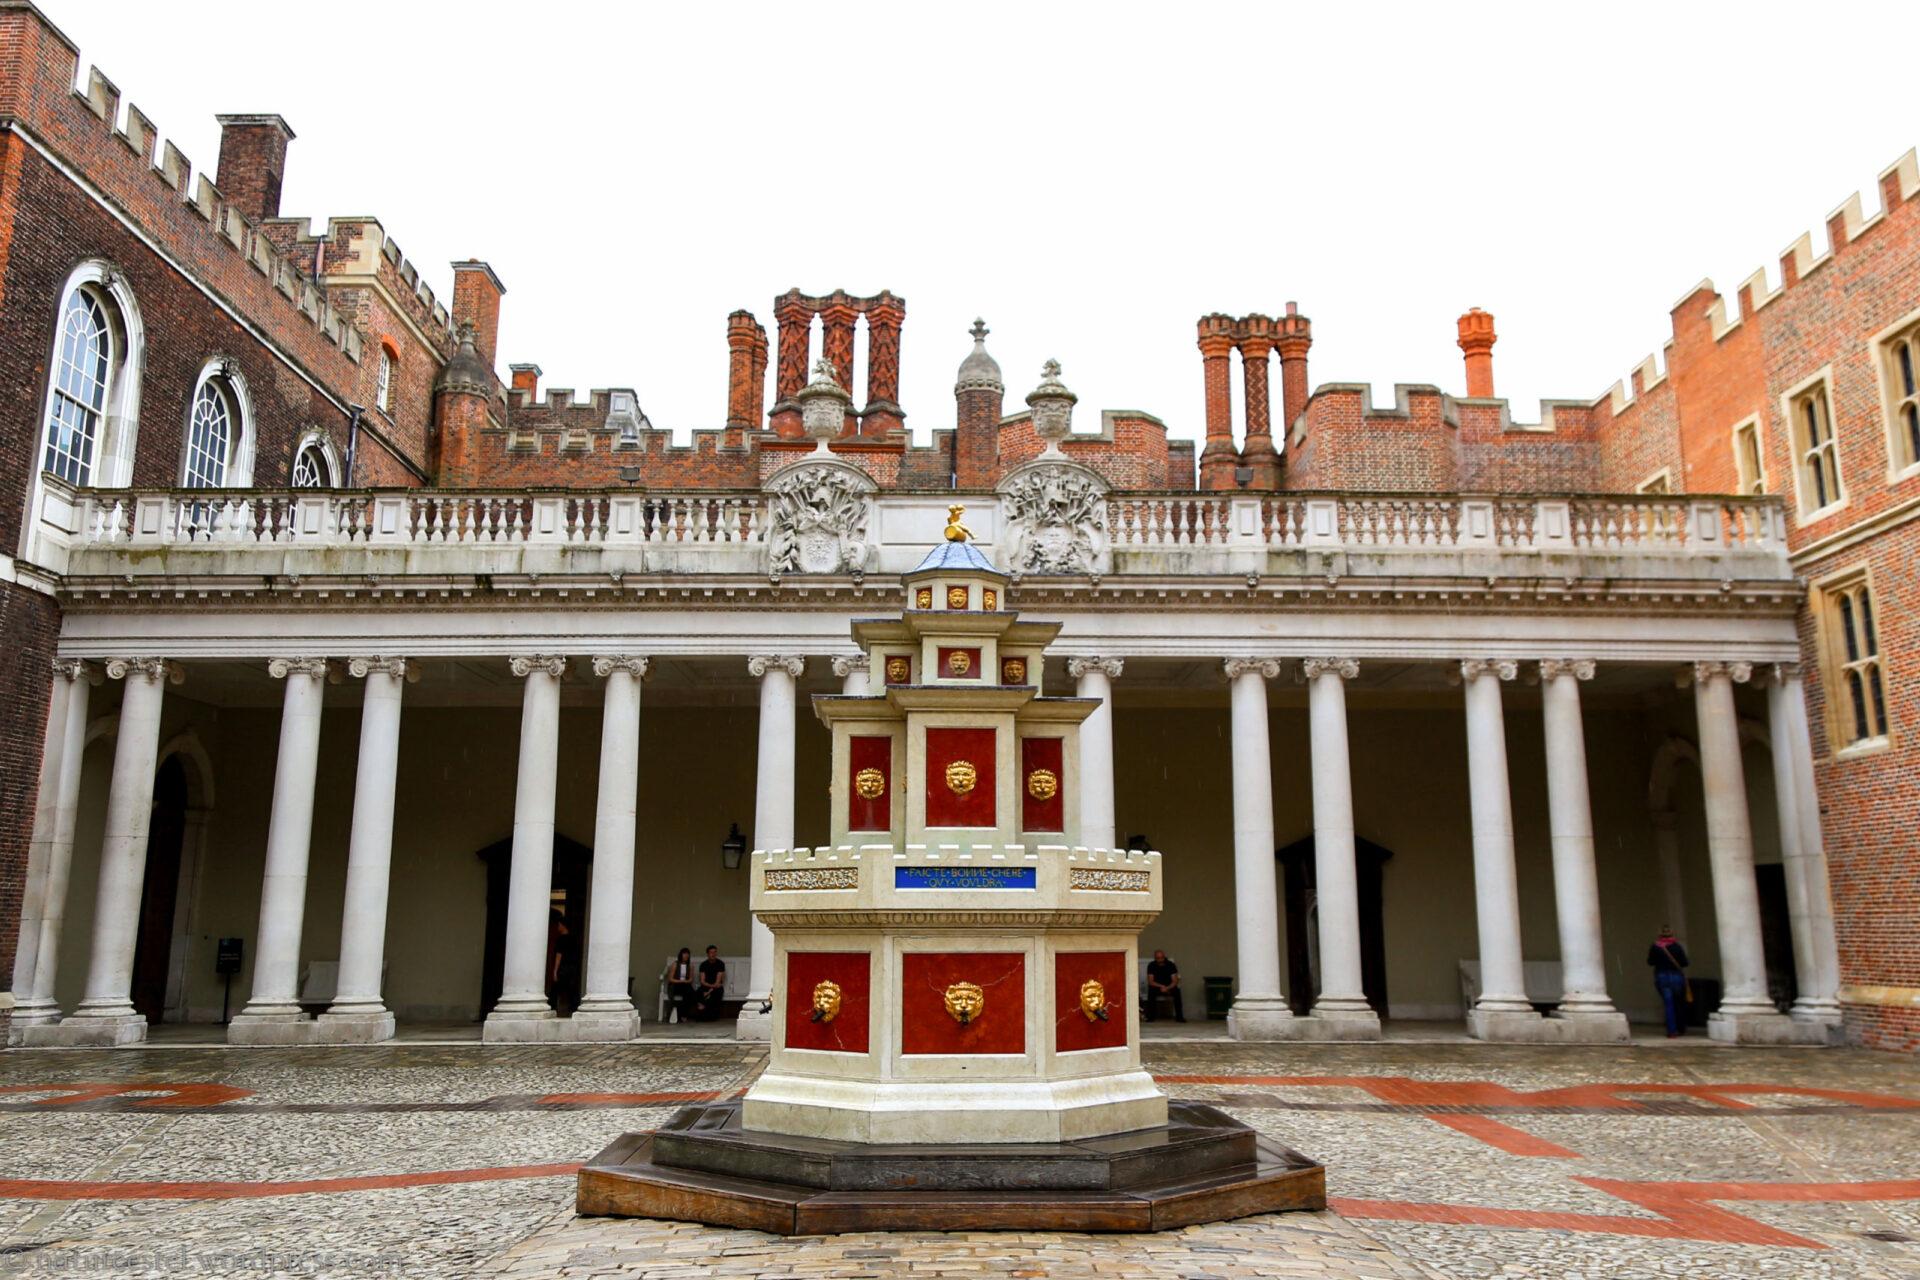 Дворец Hapmton Court. Жемчужина Лондона, упущенная туристами